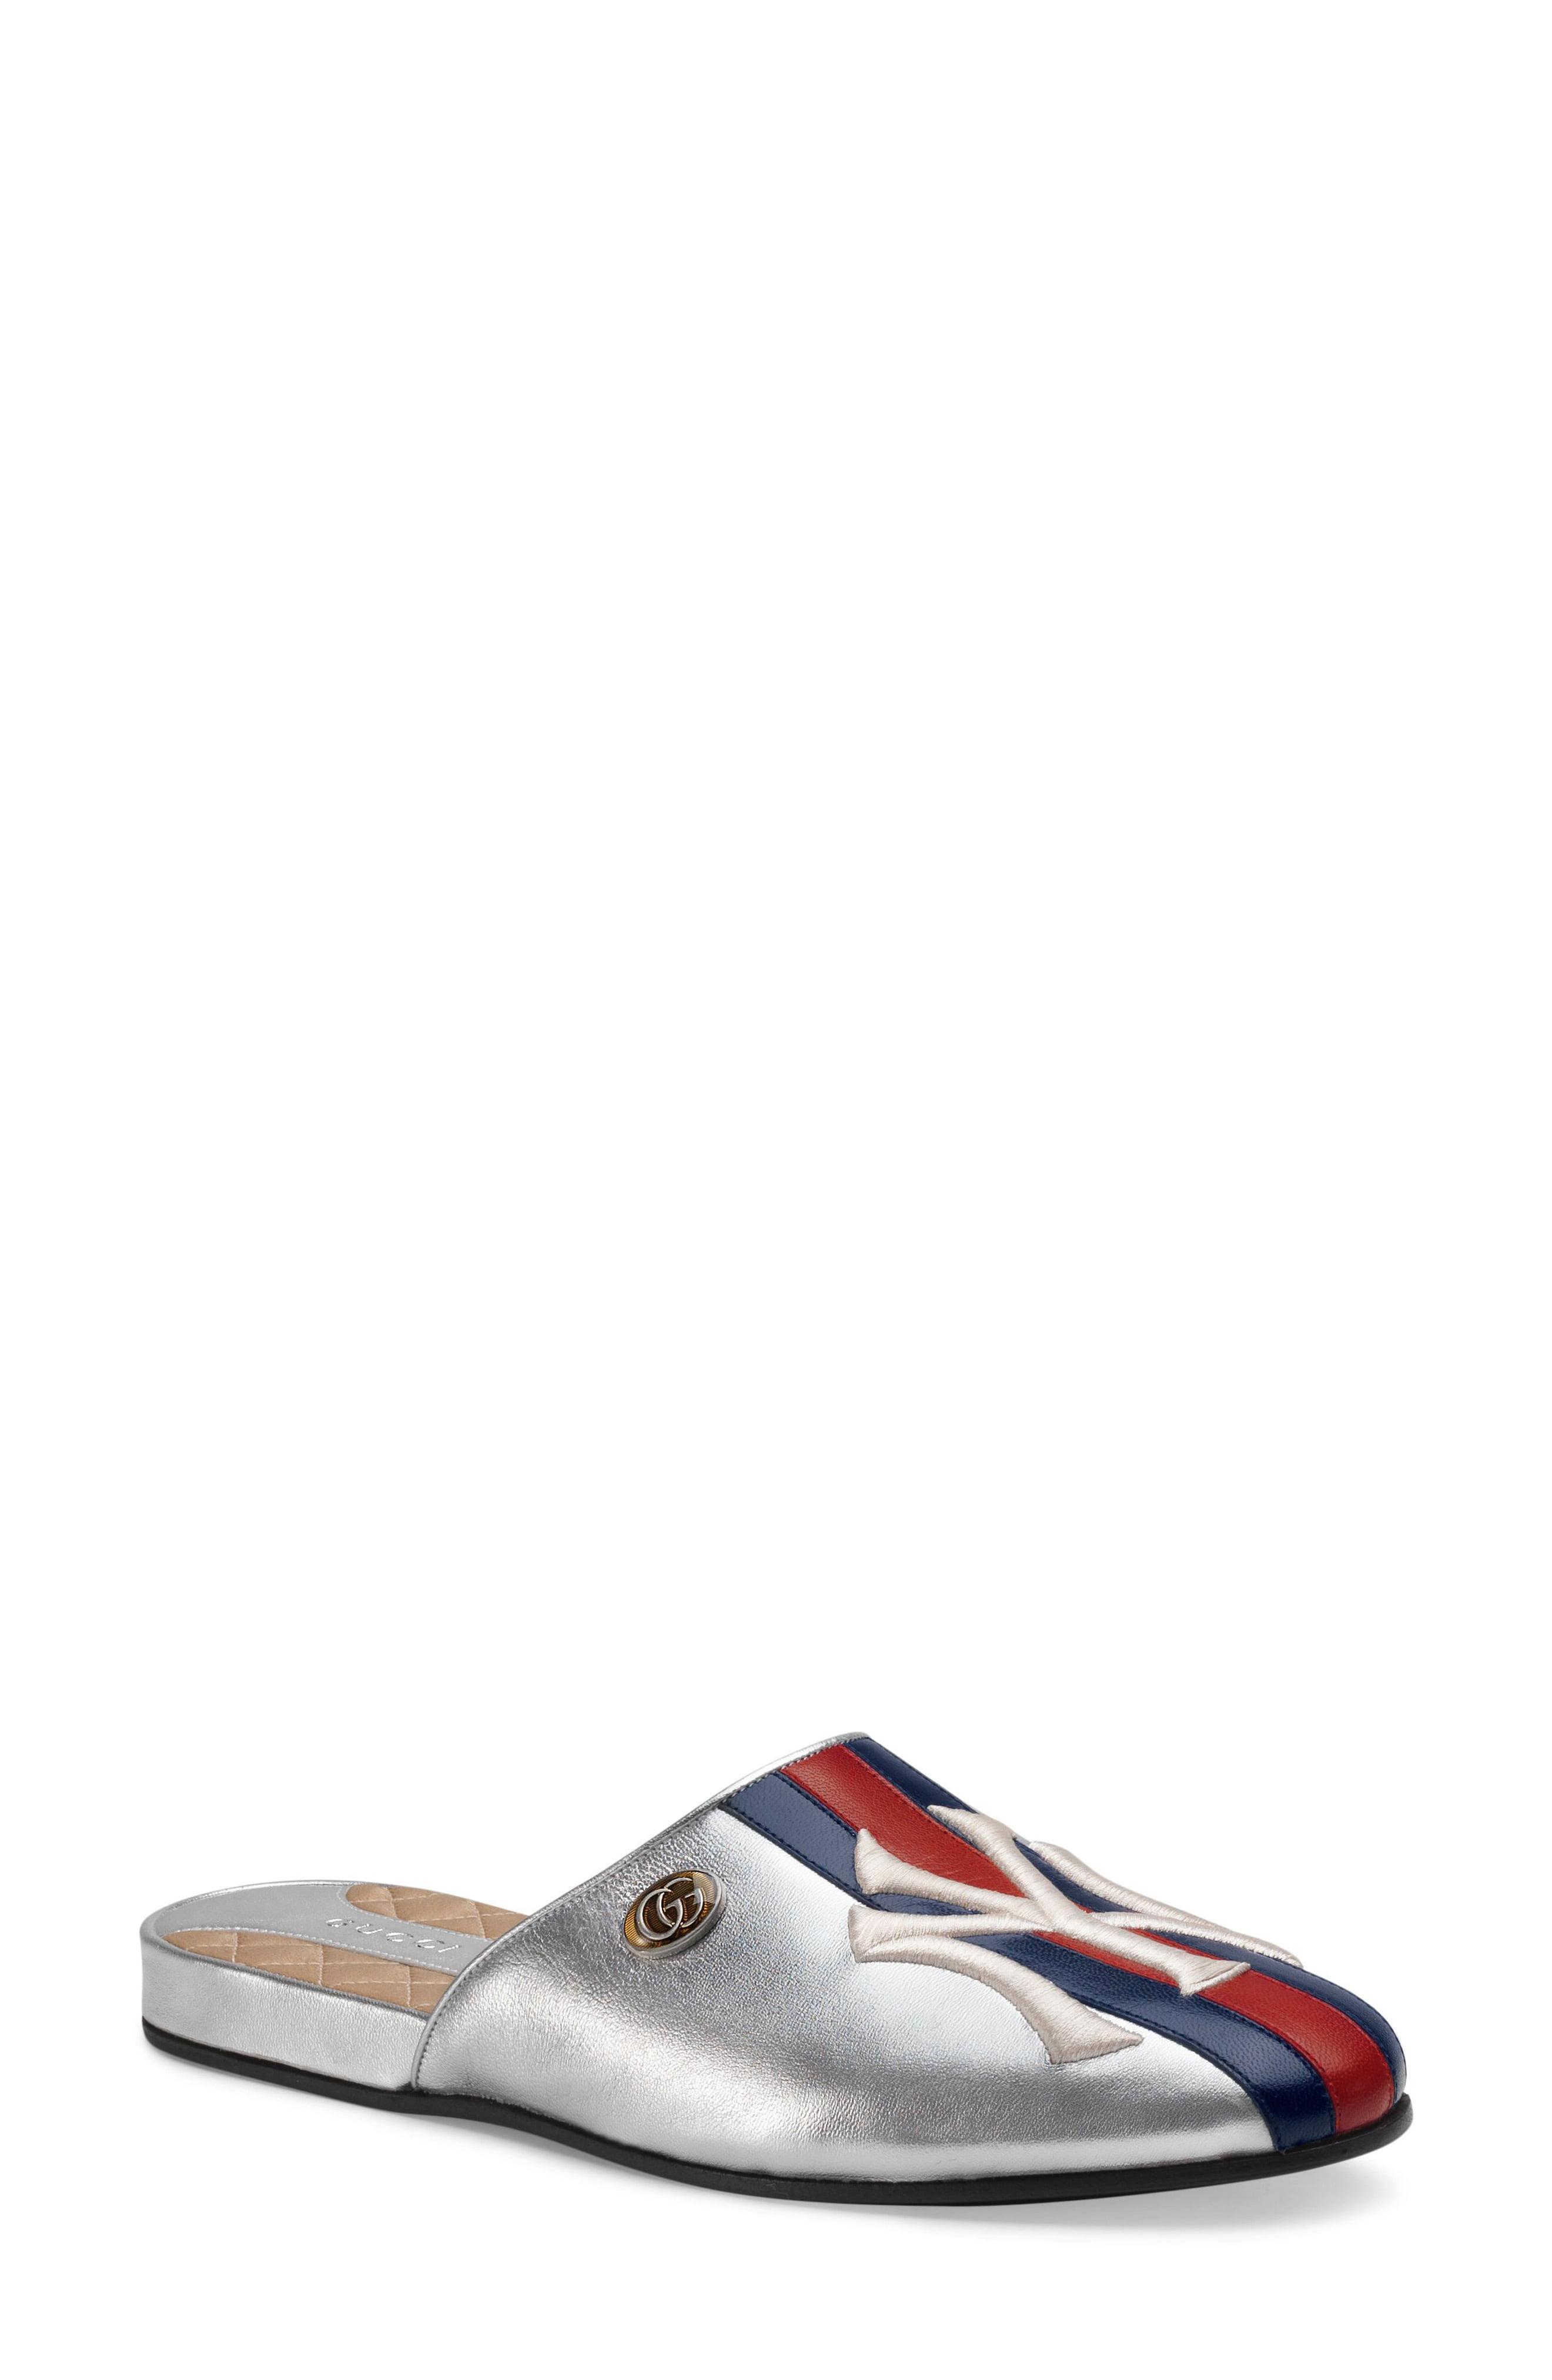 803dd185a Lyst - Gucci Ny Flamel Flat Mule in Metallic